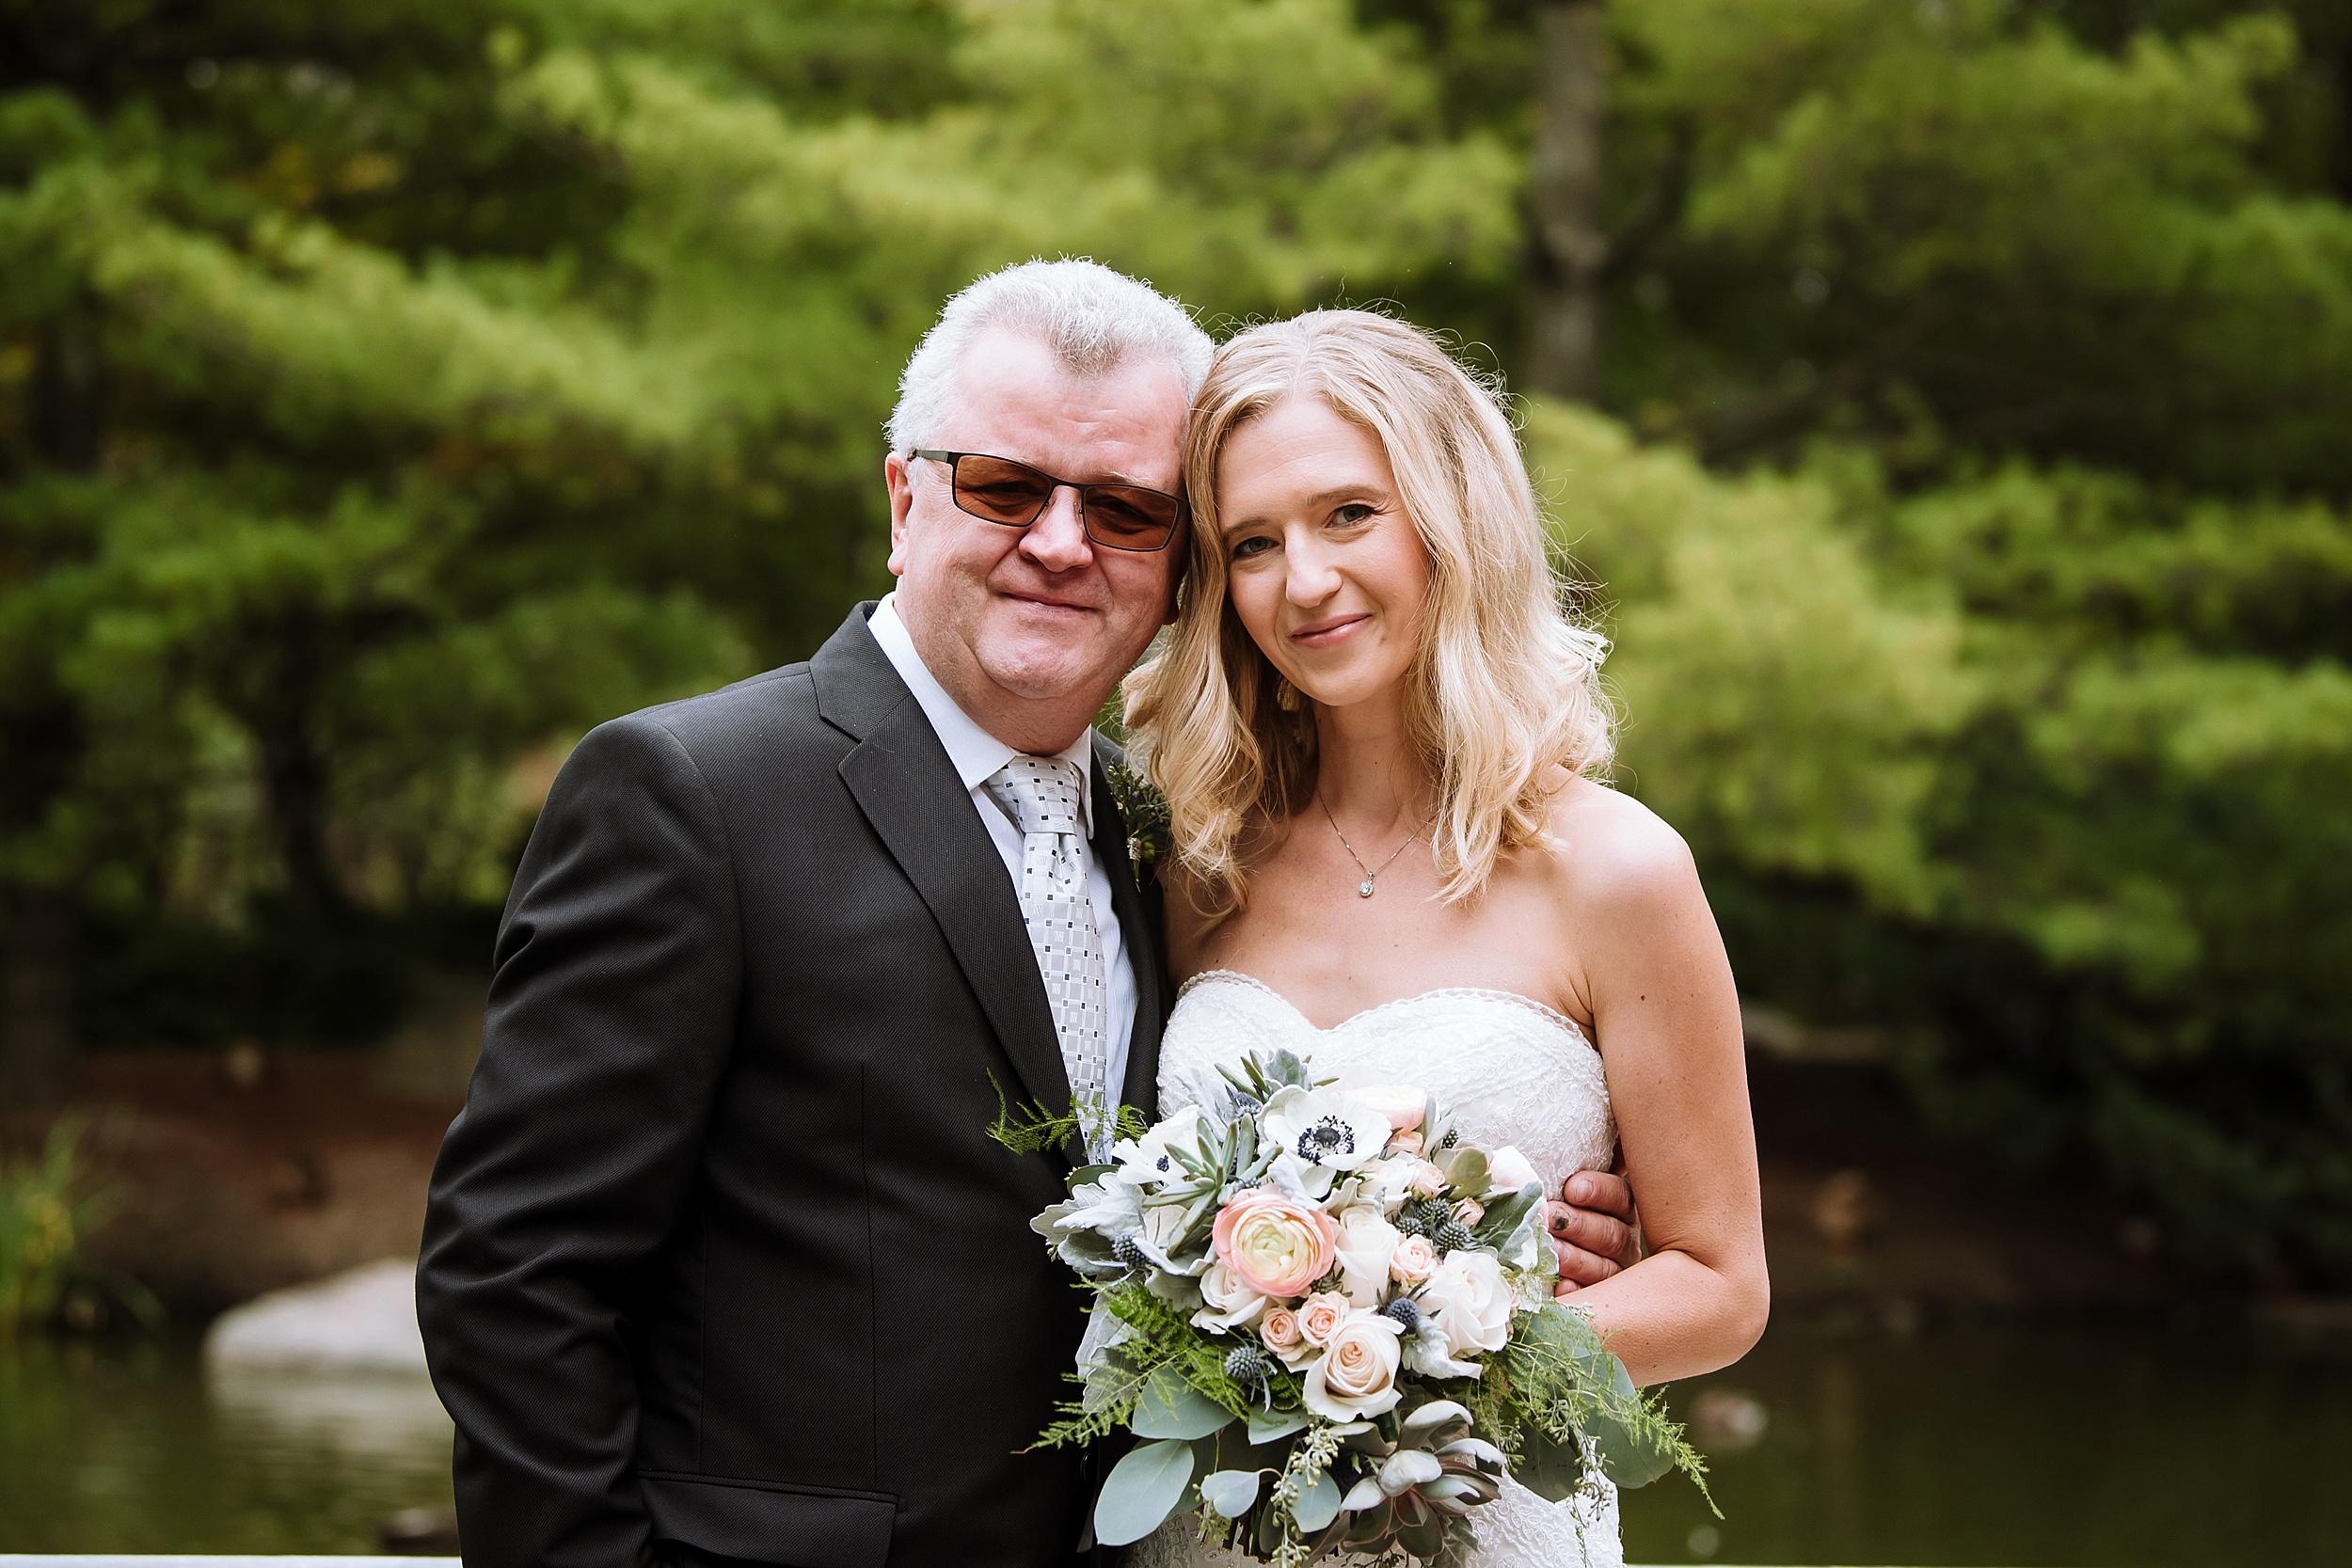 Kariya_Park_Wedding_Shoot_Toronto_Photographer_0059.jpg